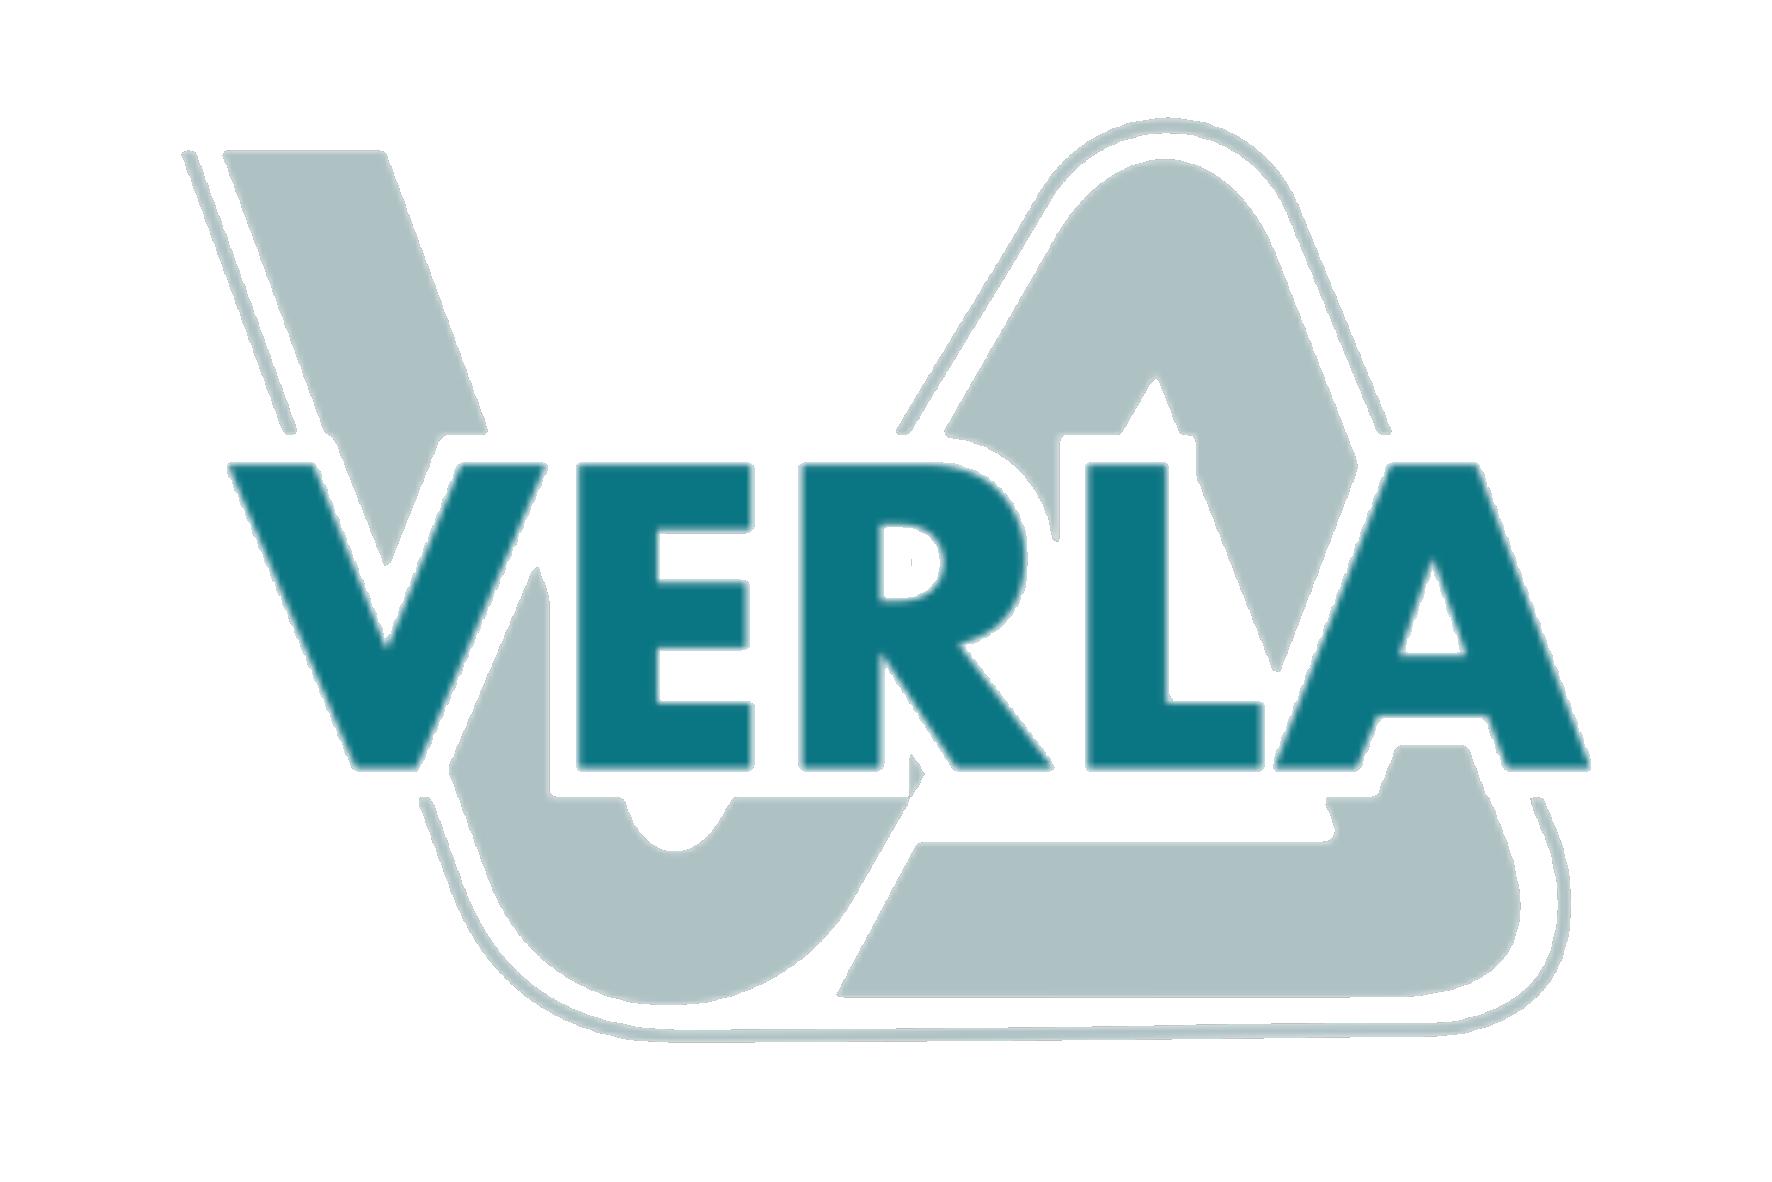 Verla